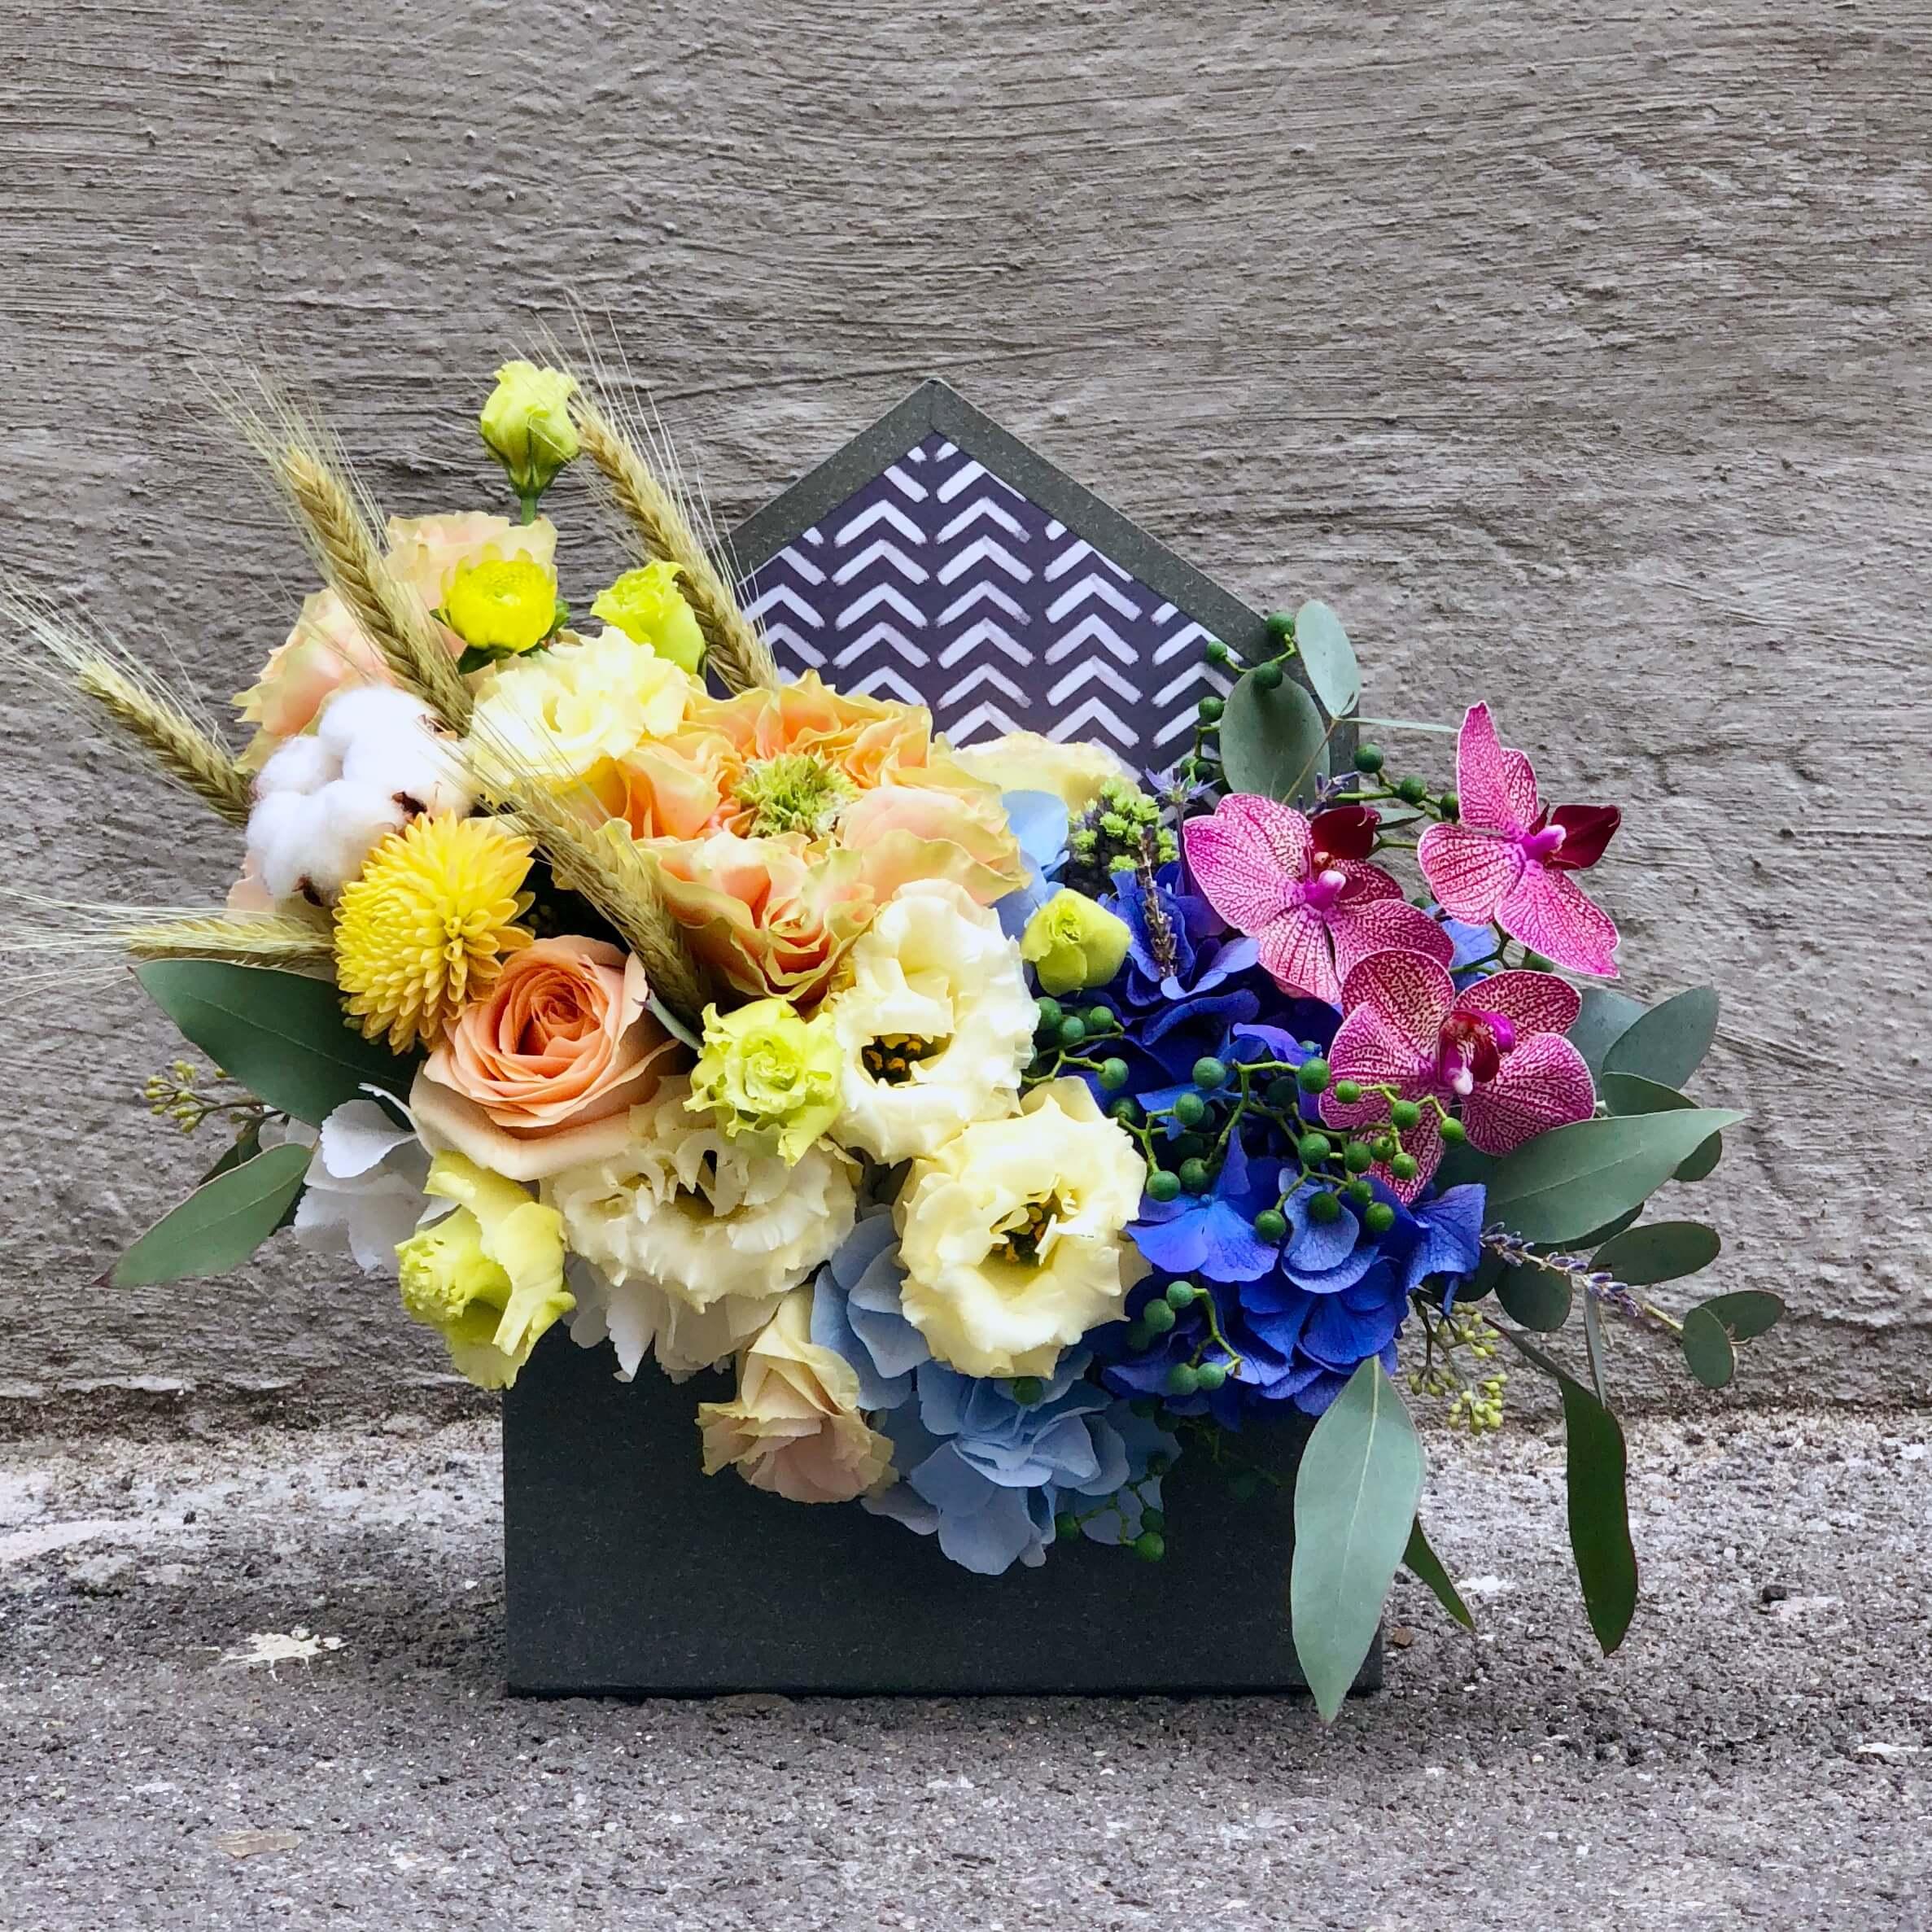 Aranjament Floral Cu Hortensia Albastra Imodflowers